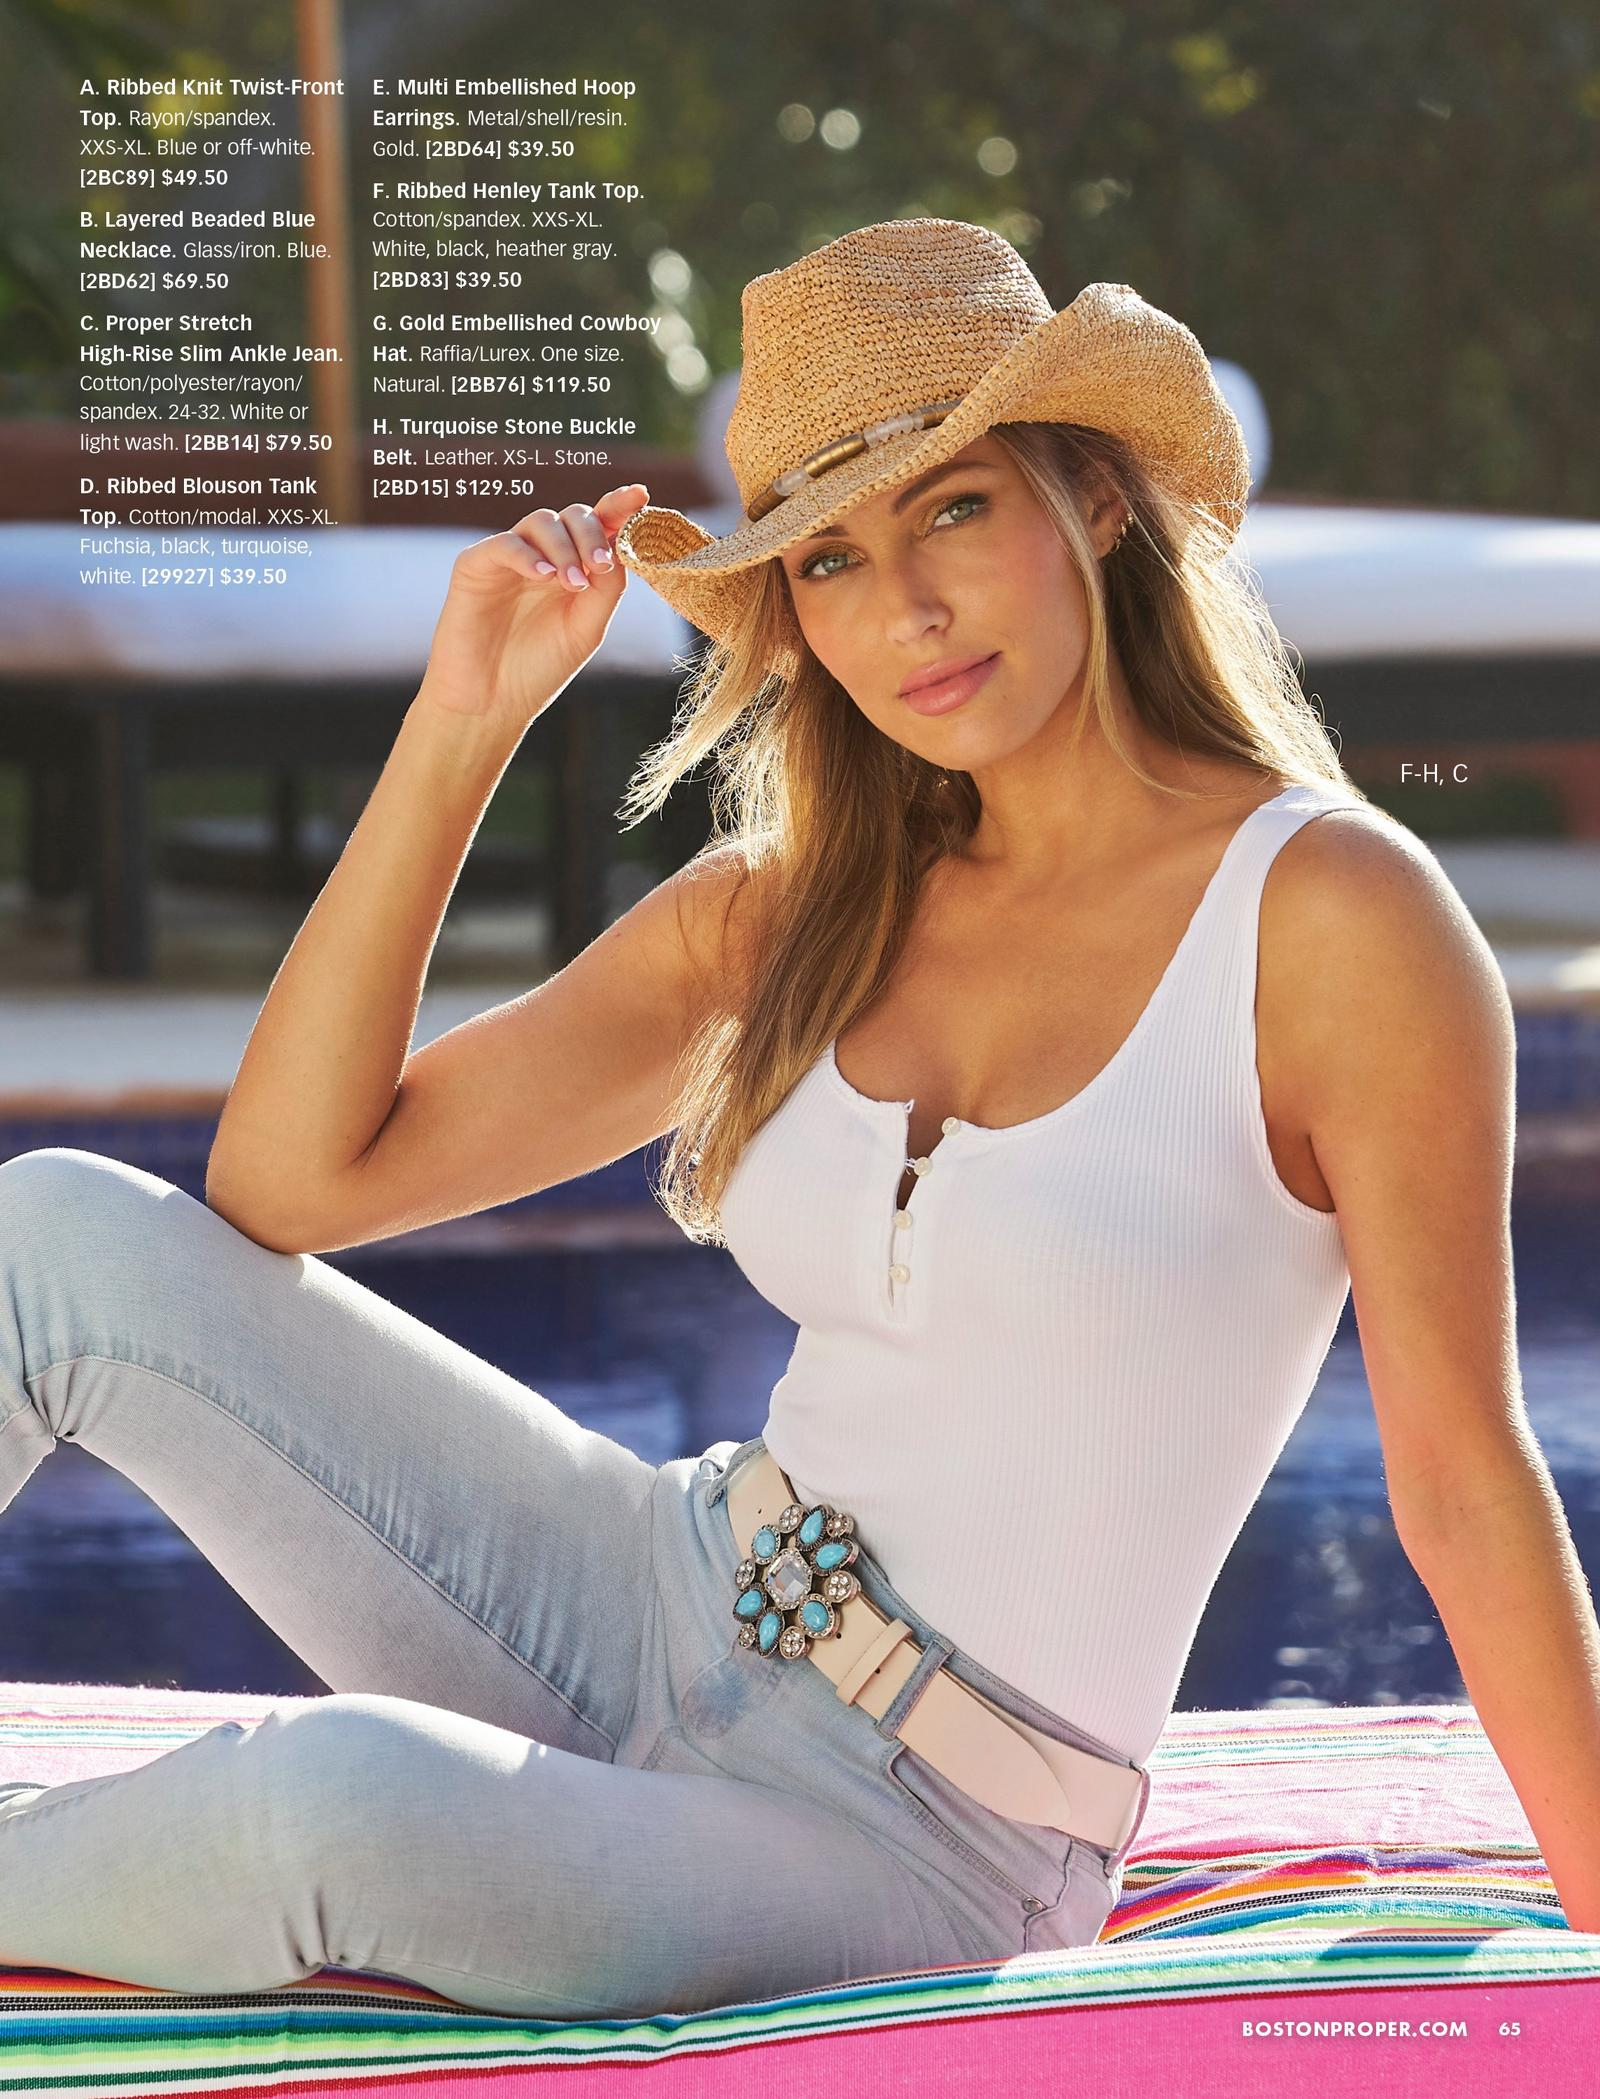 model wearing a white henley tank top, blue stone embellished belt, light wash jeans, and gold embellished cowboy hat.